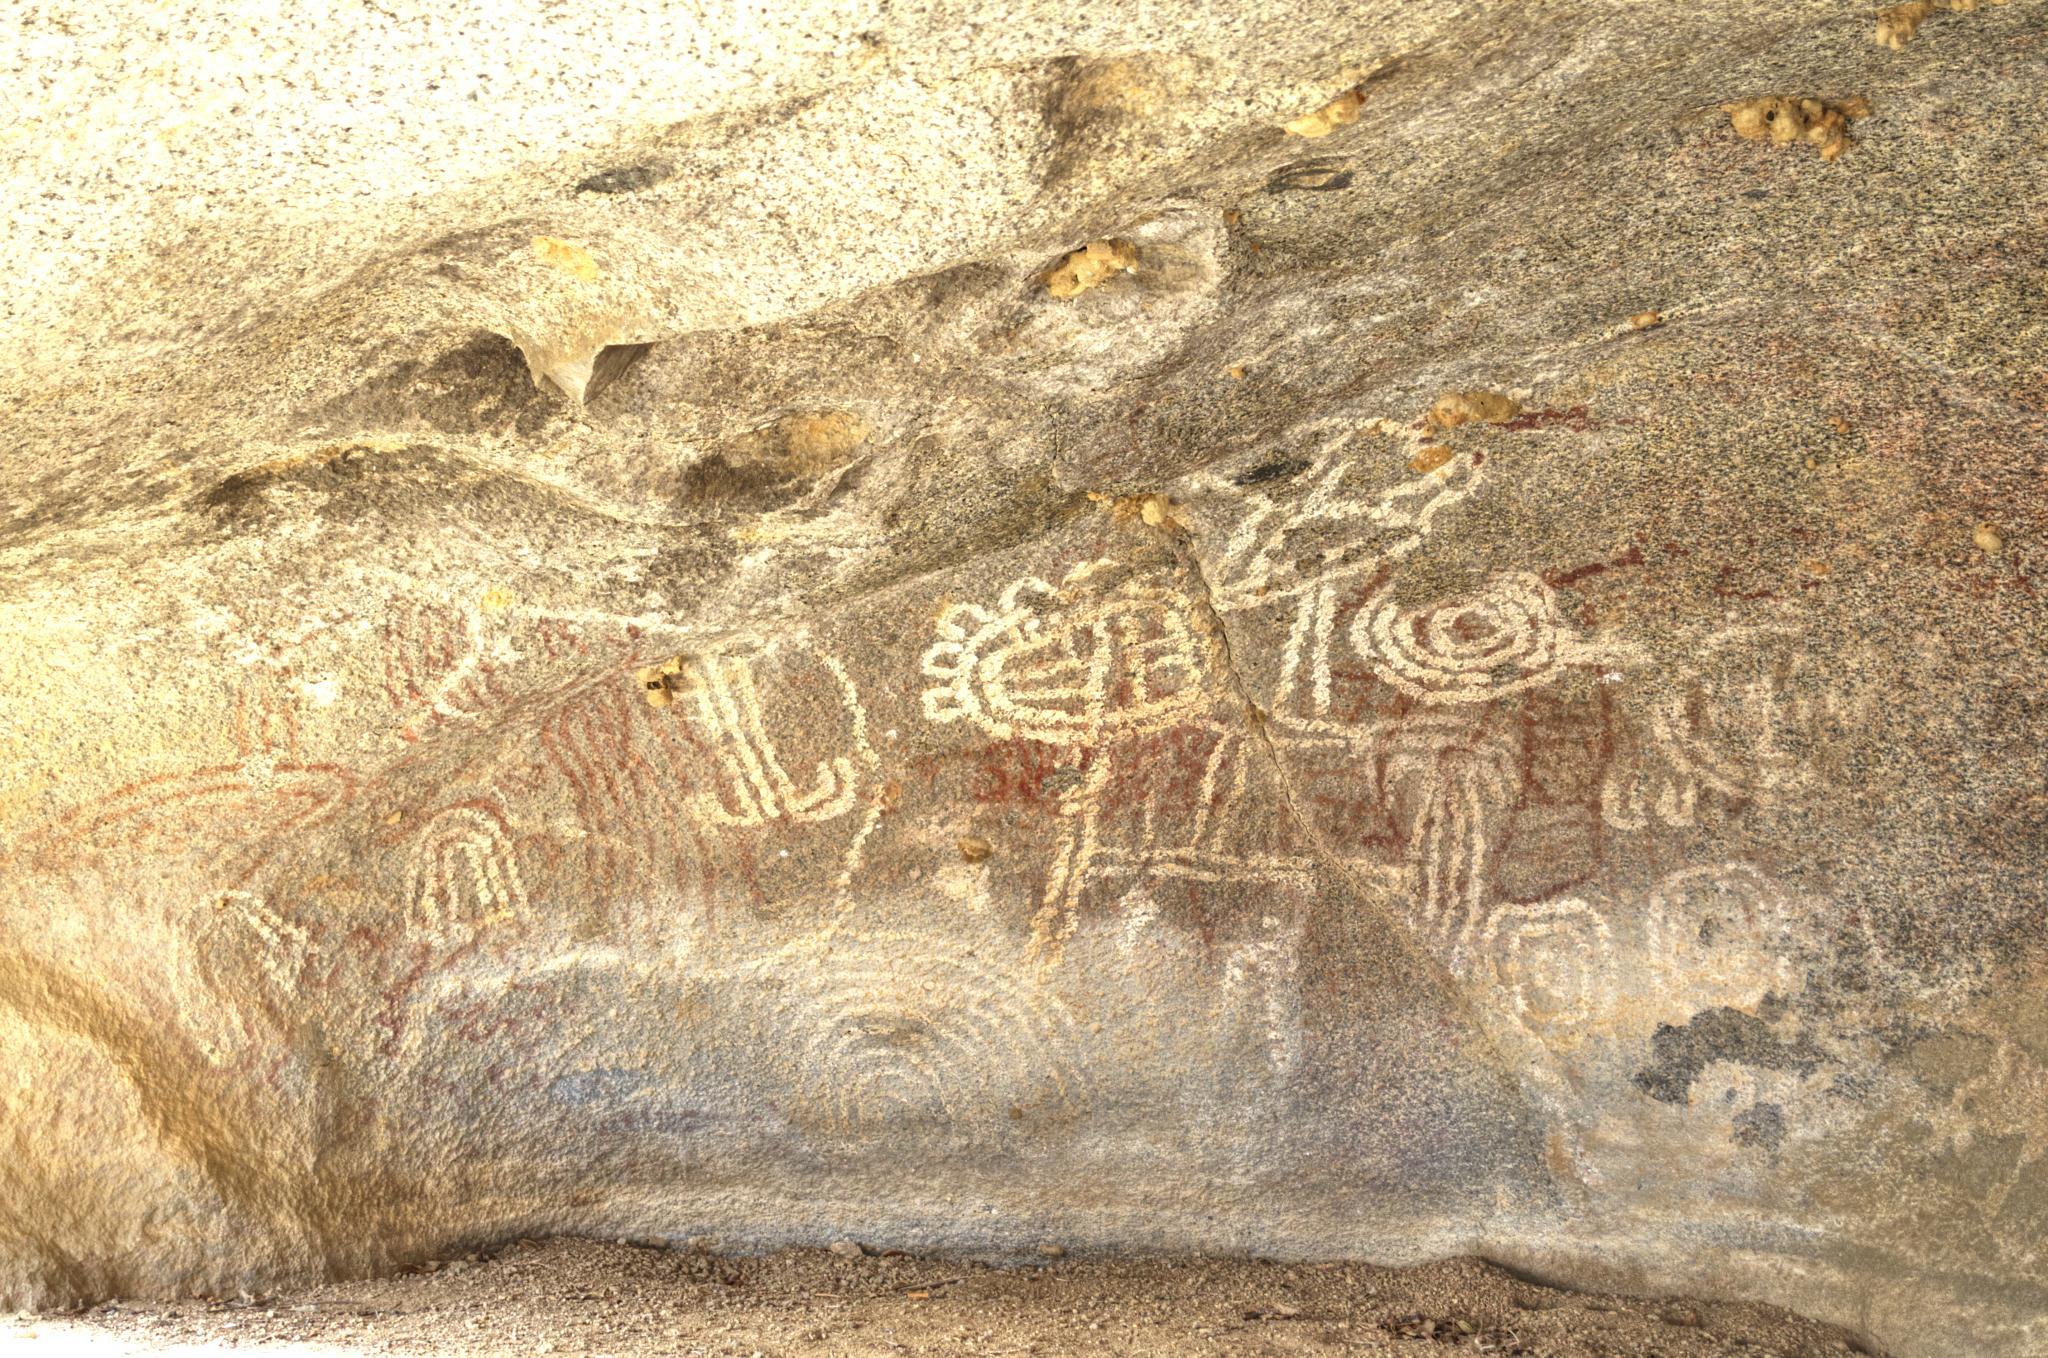 Ayo Petroglyphs 2 by kersten.conway